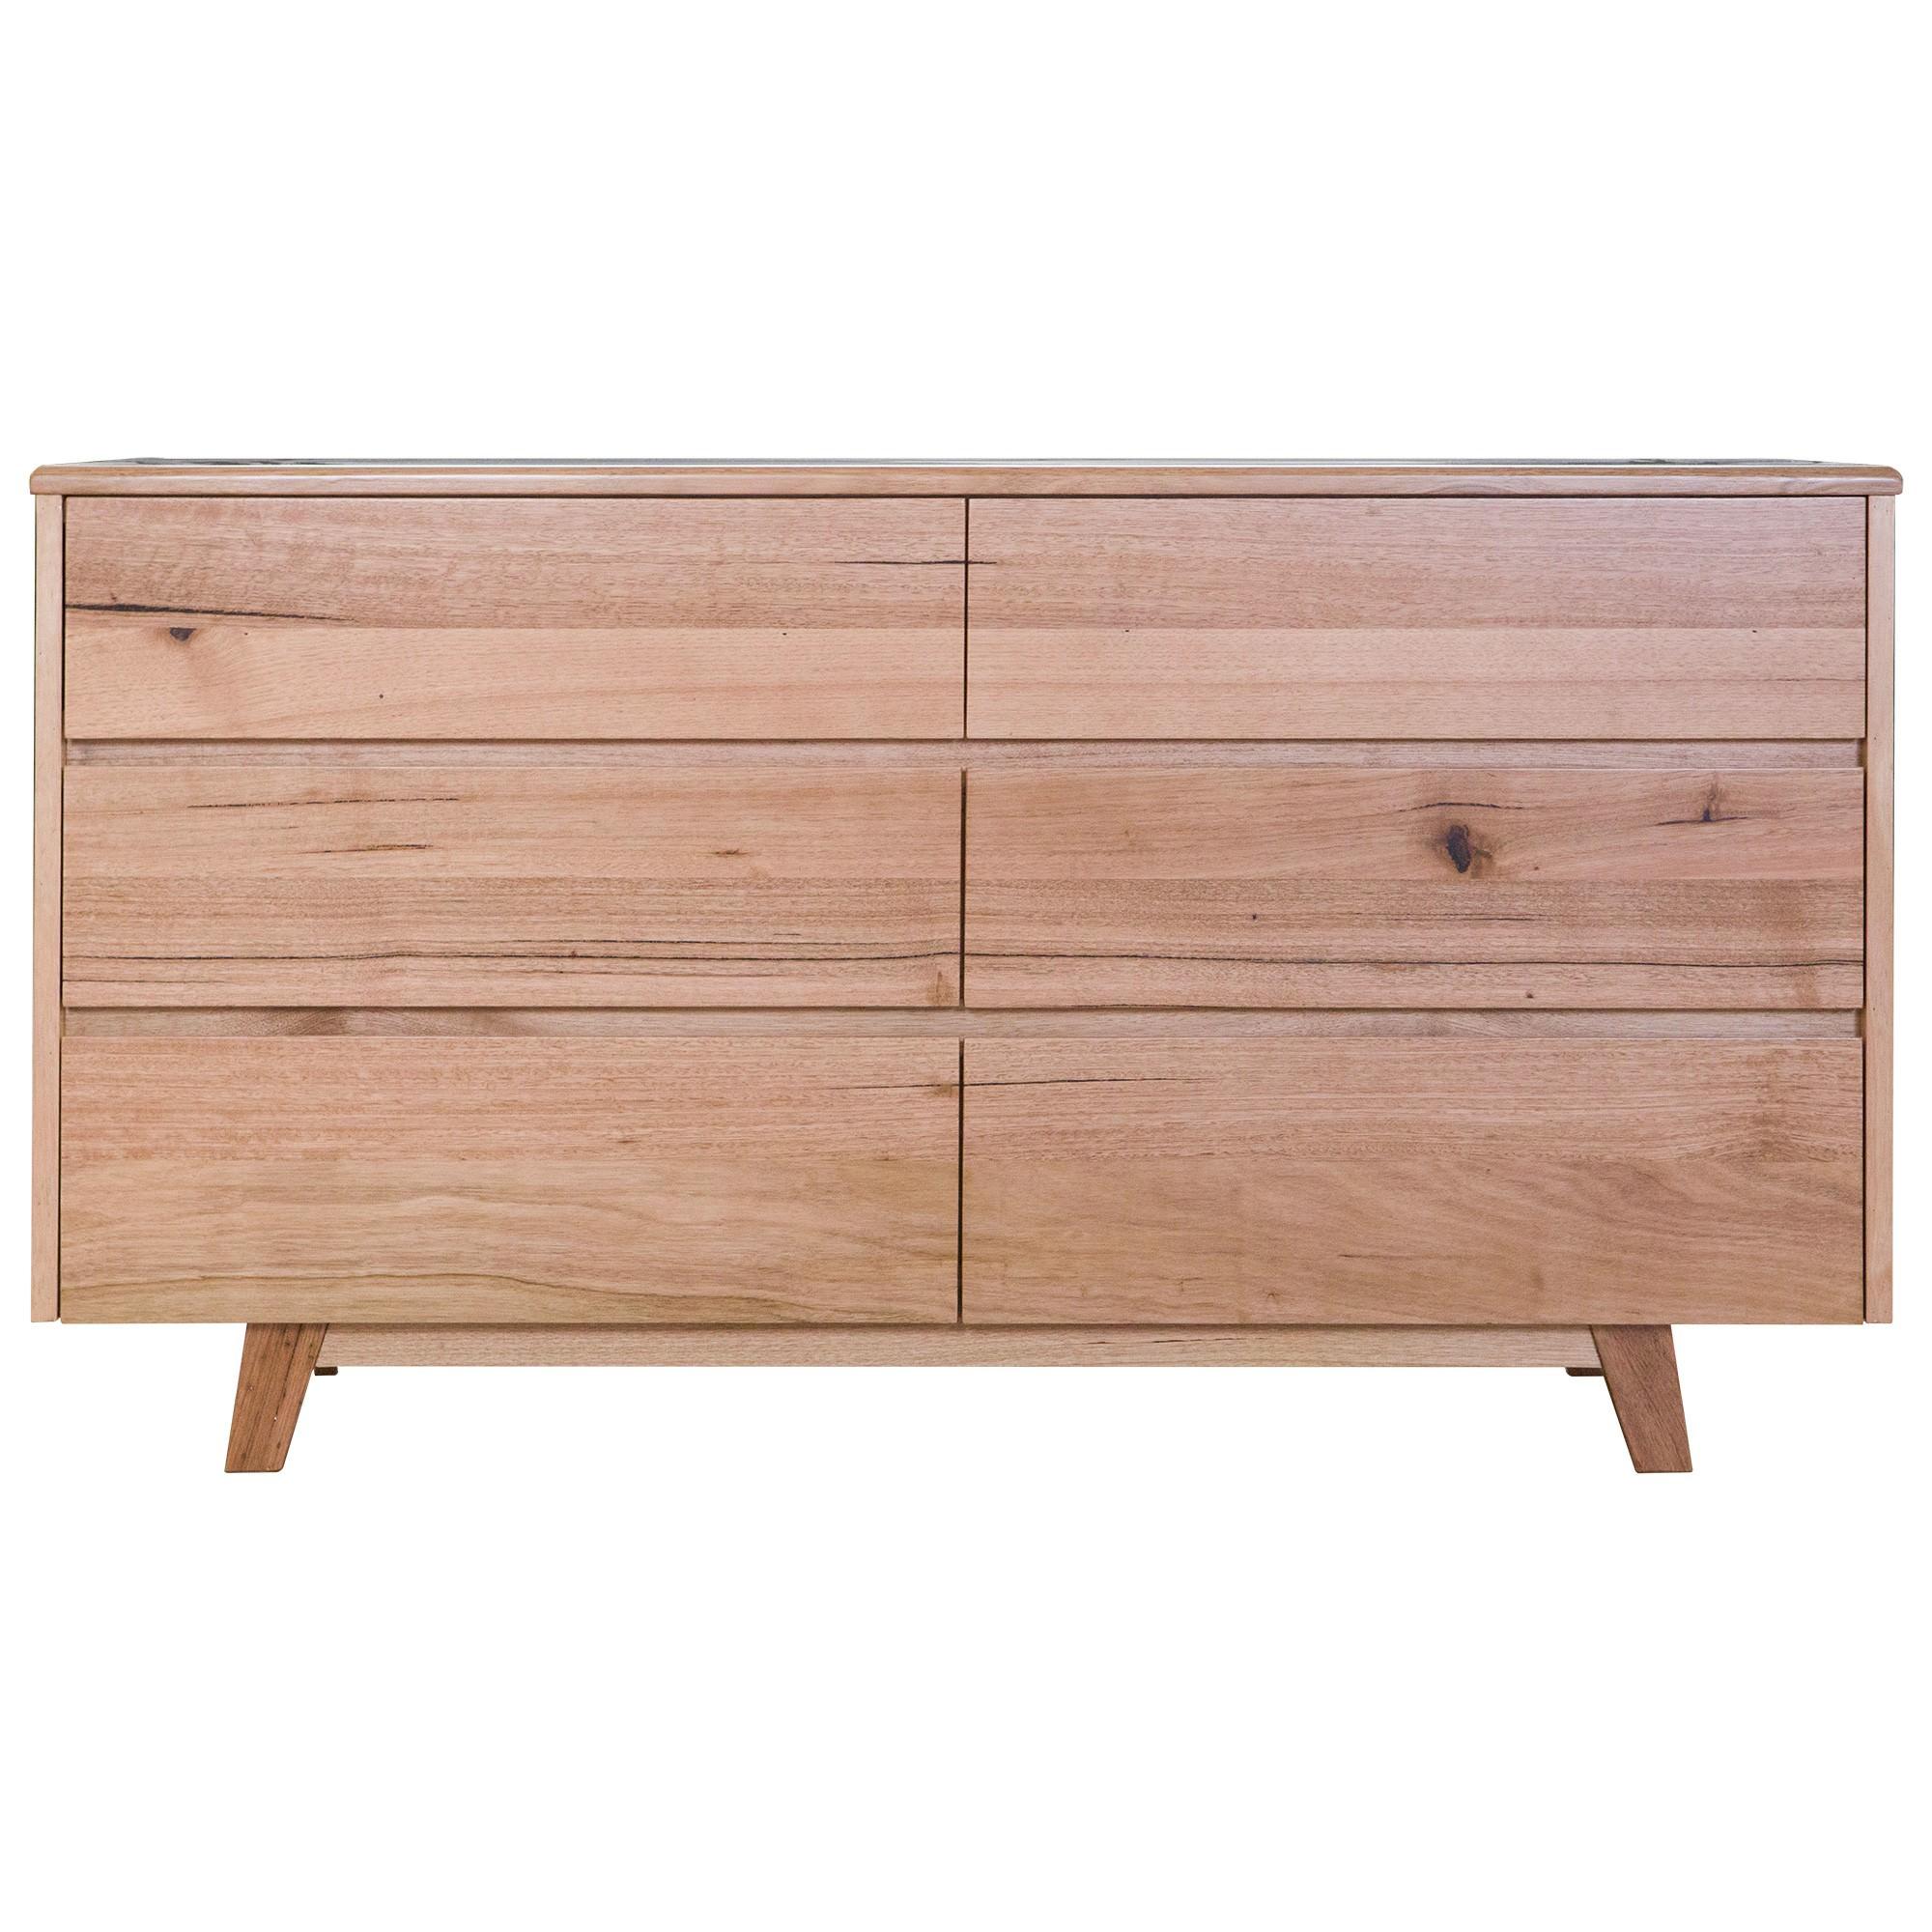 Wade Tasmanian Oak Timber 6 Drawer Dresser